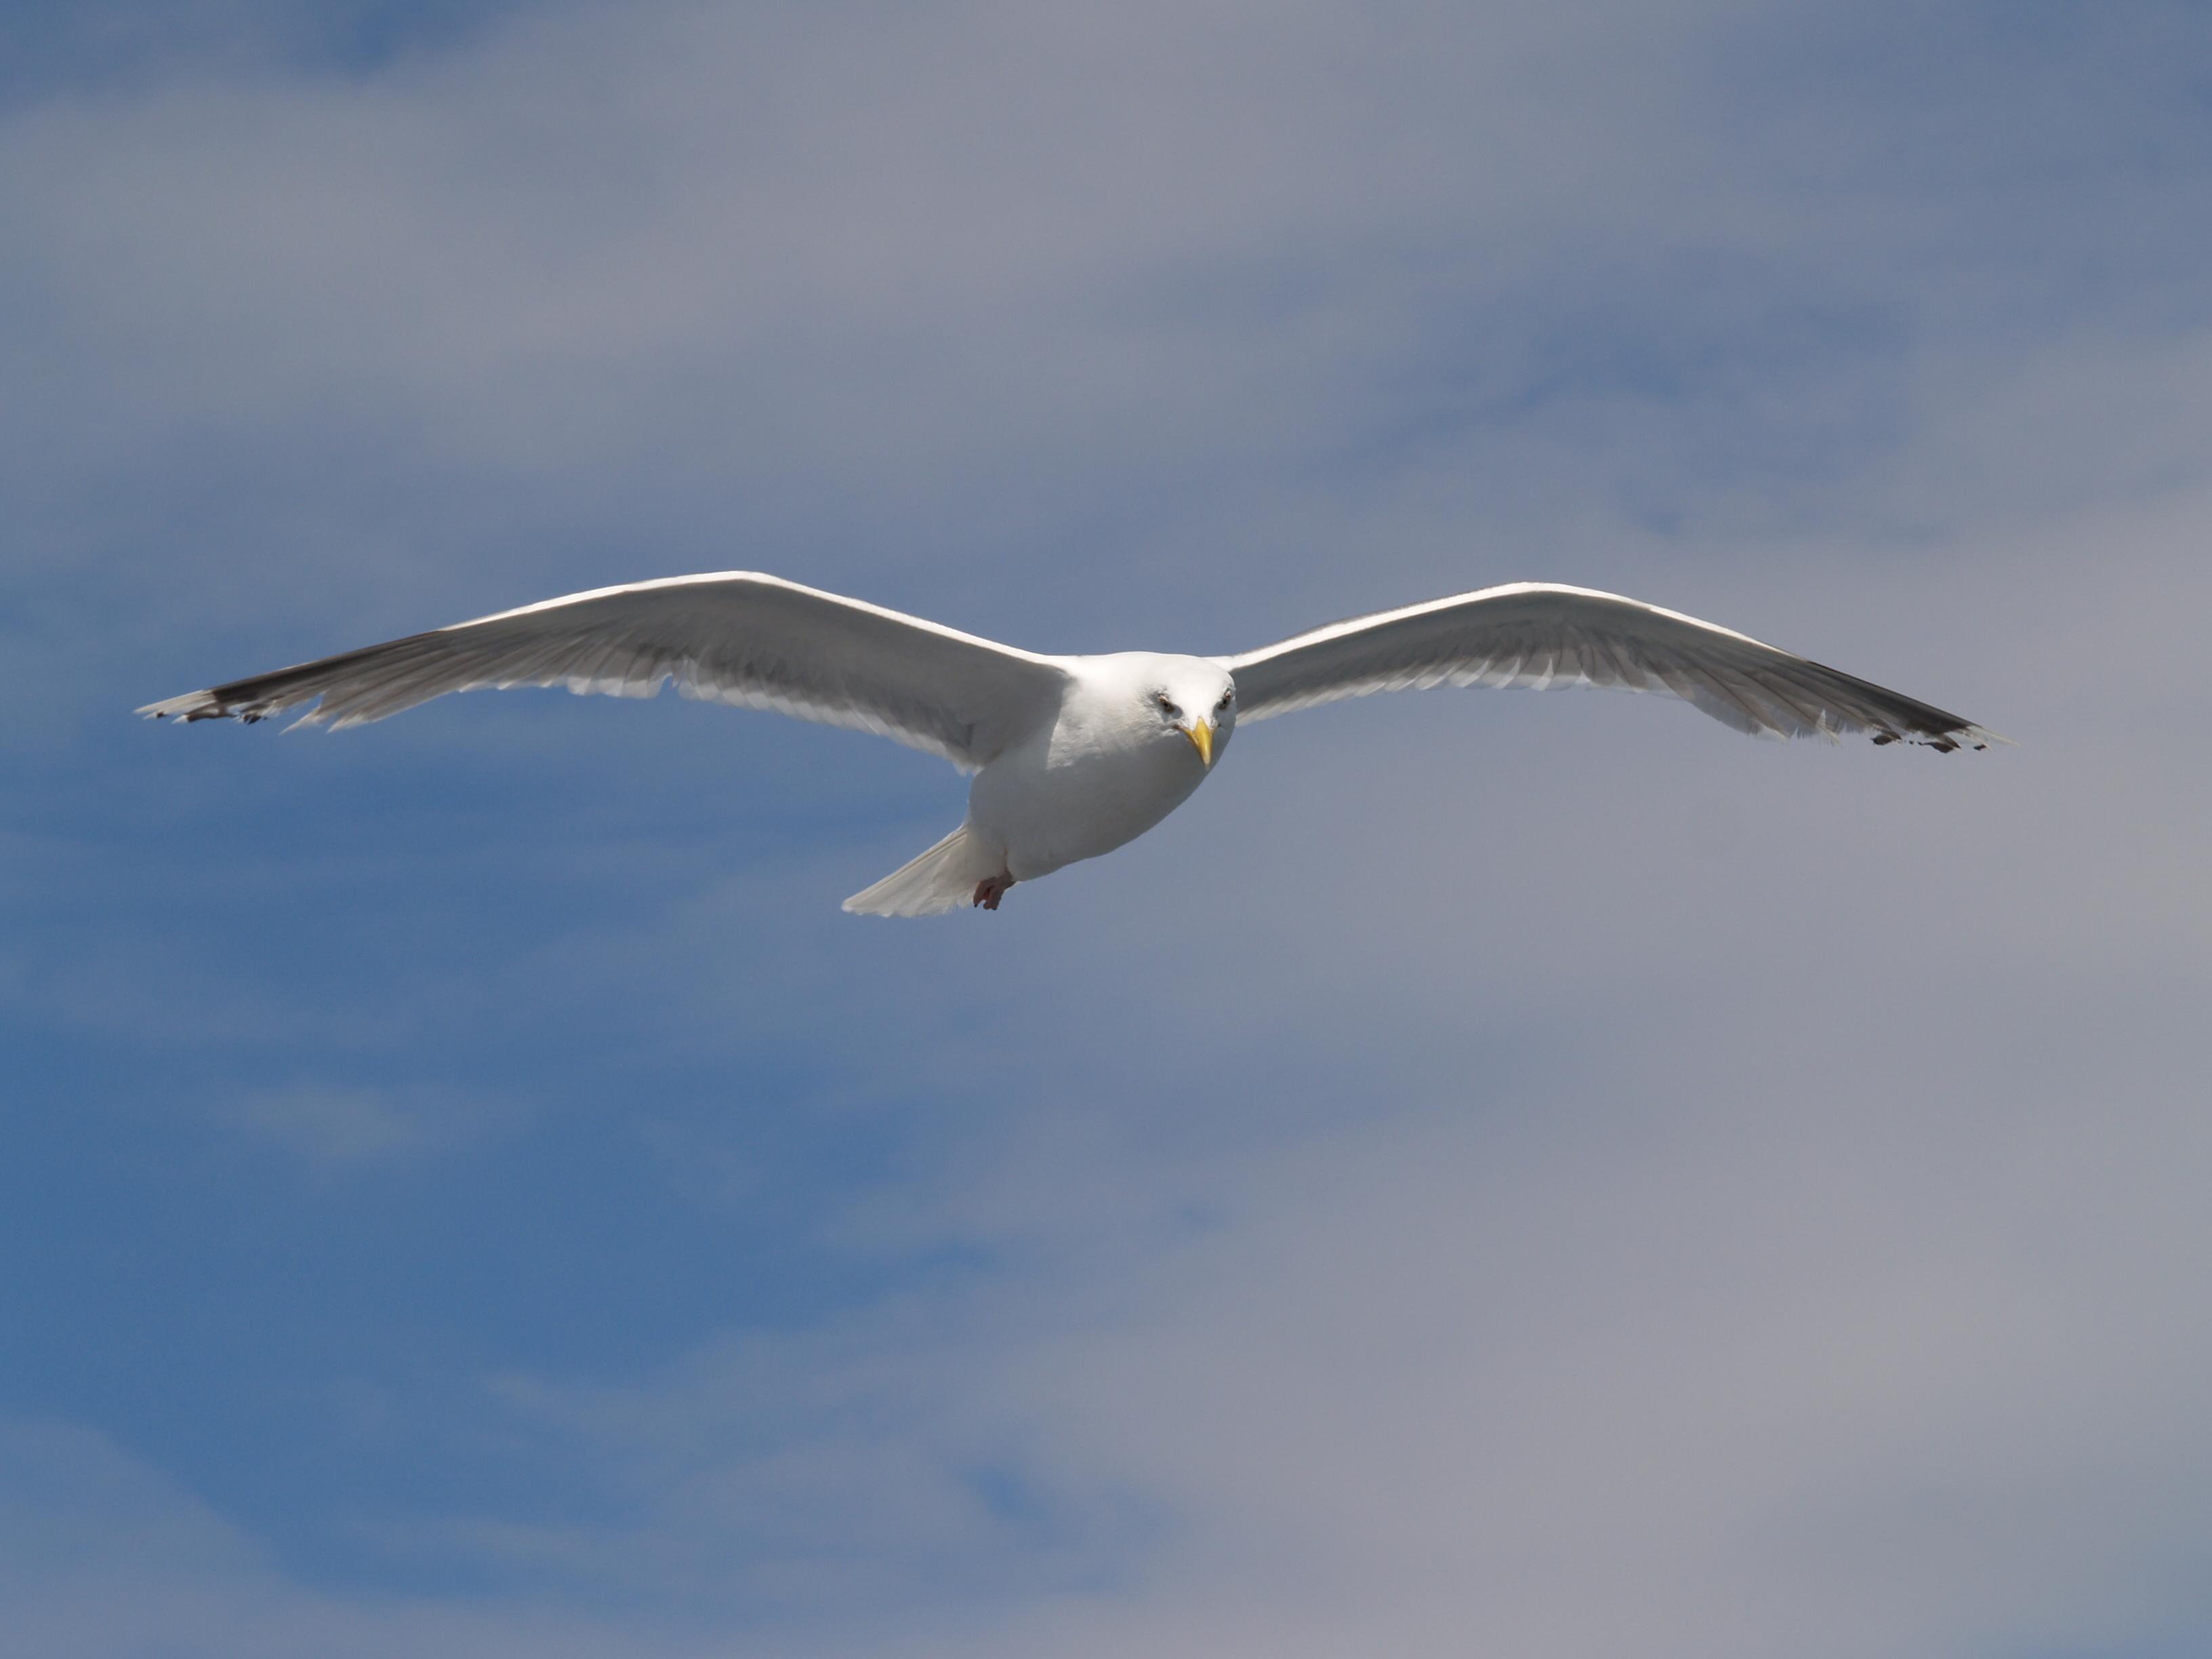 File:Seagull flying (3).jpg - Wikimedia Commons